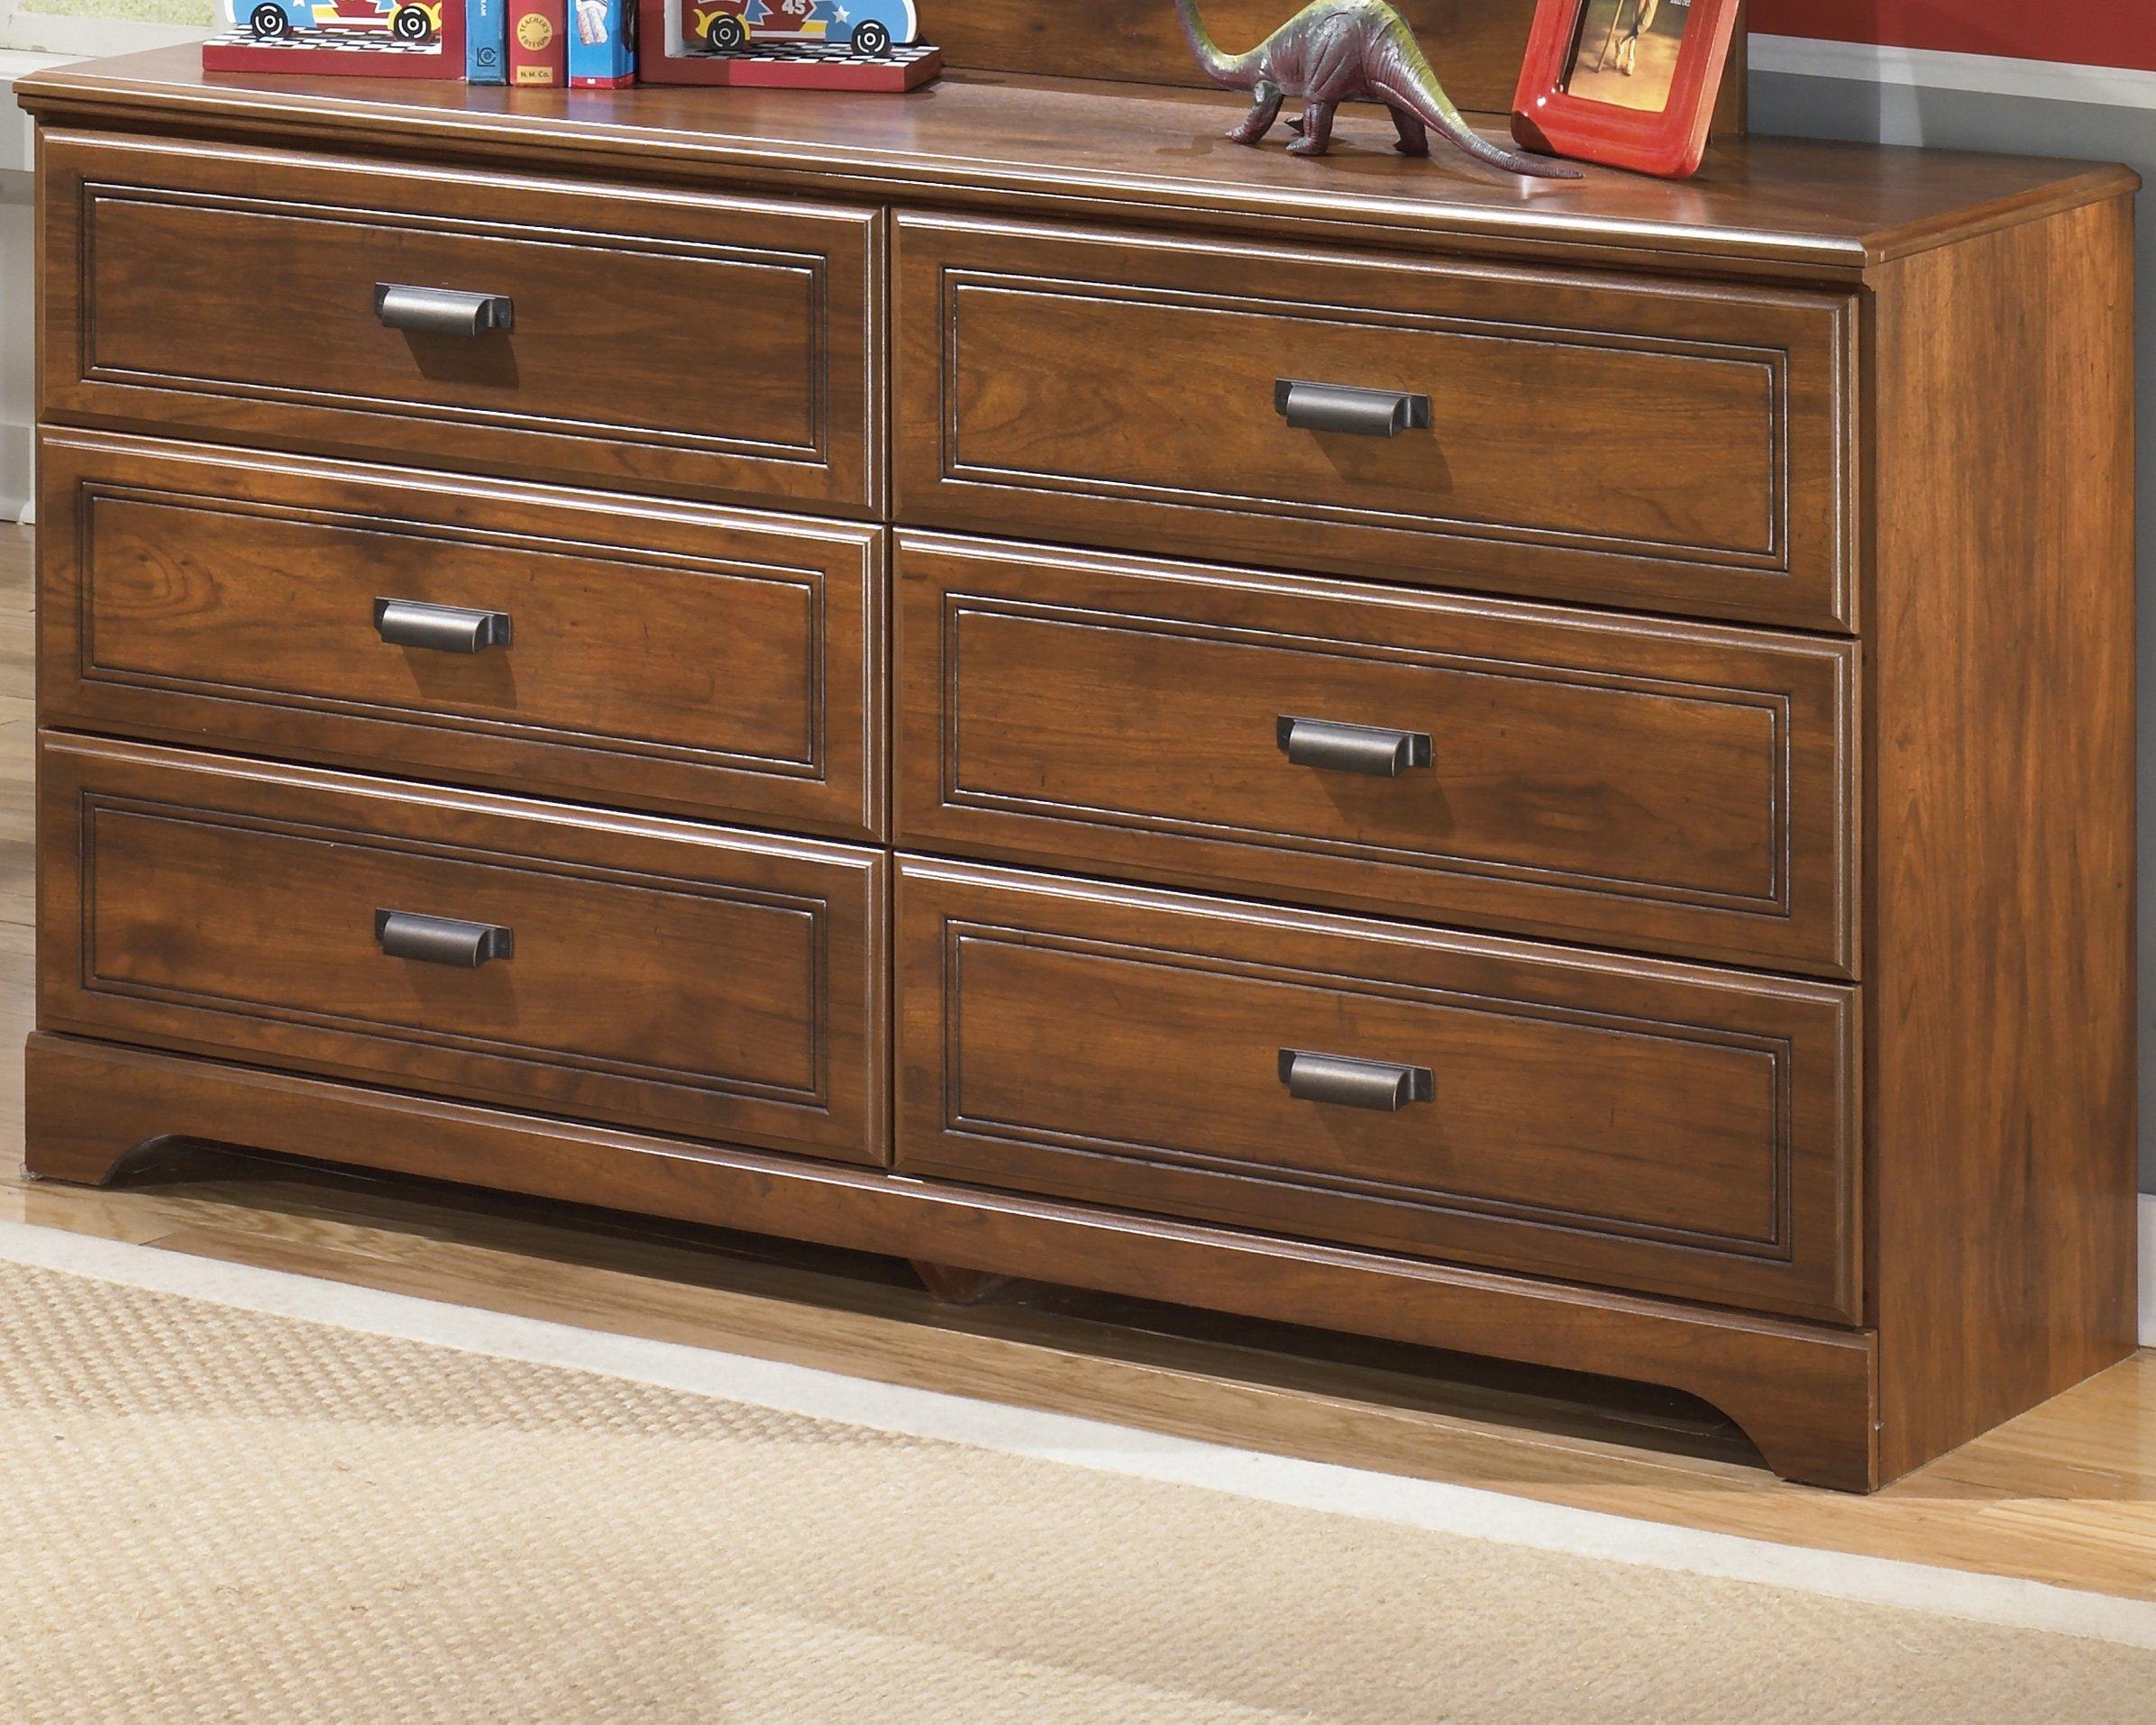 Ashley Furniture Signature Design - Barchan Dresser - 6 Drawer - Casual Replicated Cherry Grain - Medium Brown